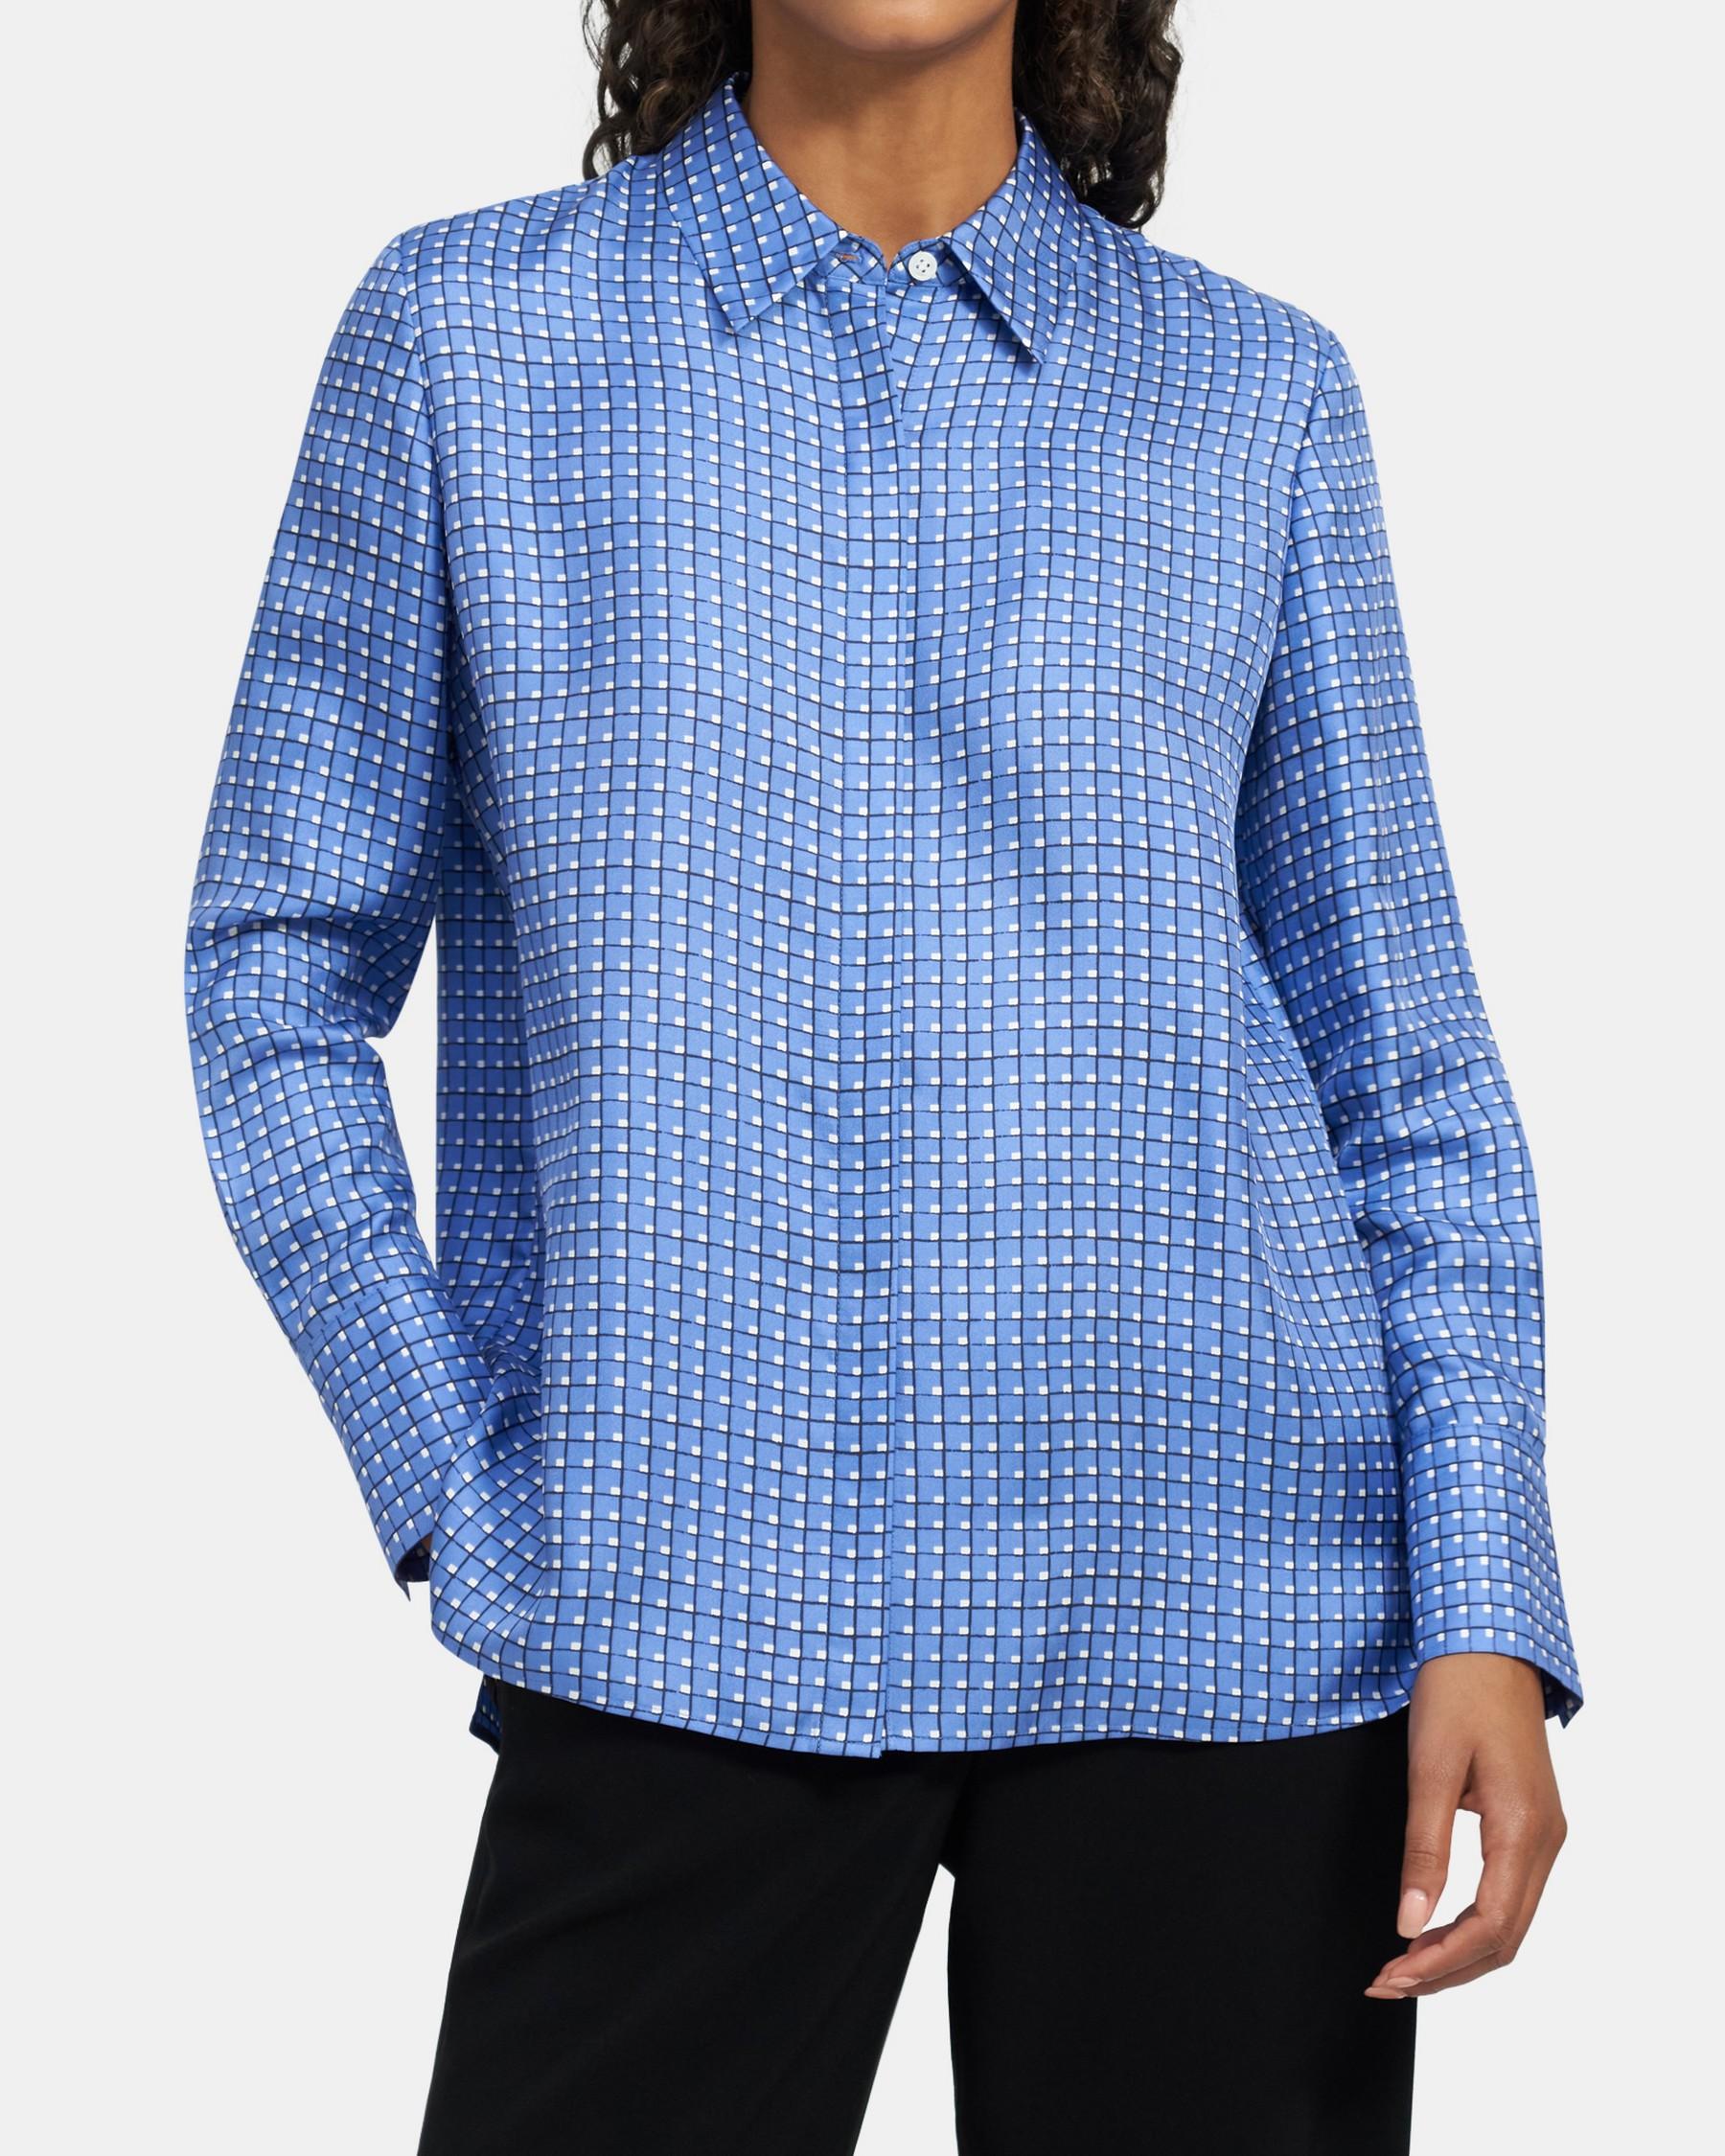 Sunaya Shirt in Color-Blocked Silk   Theory